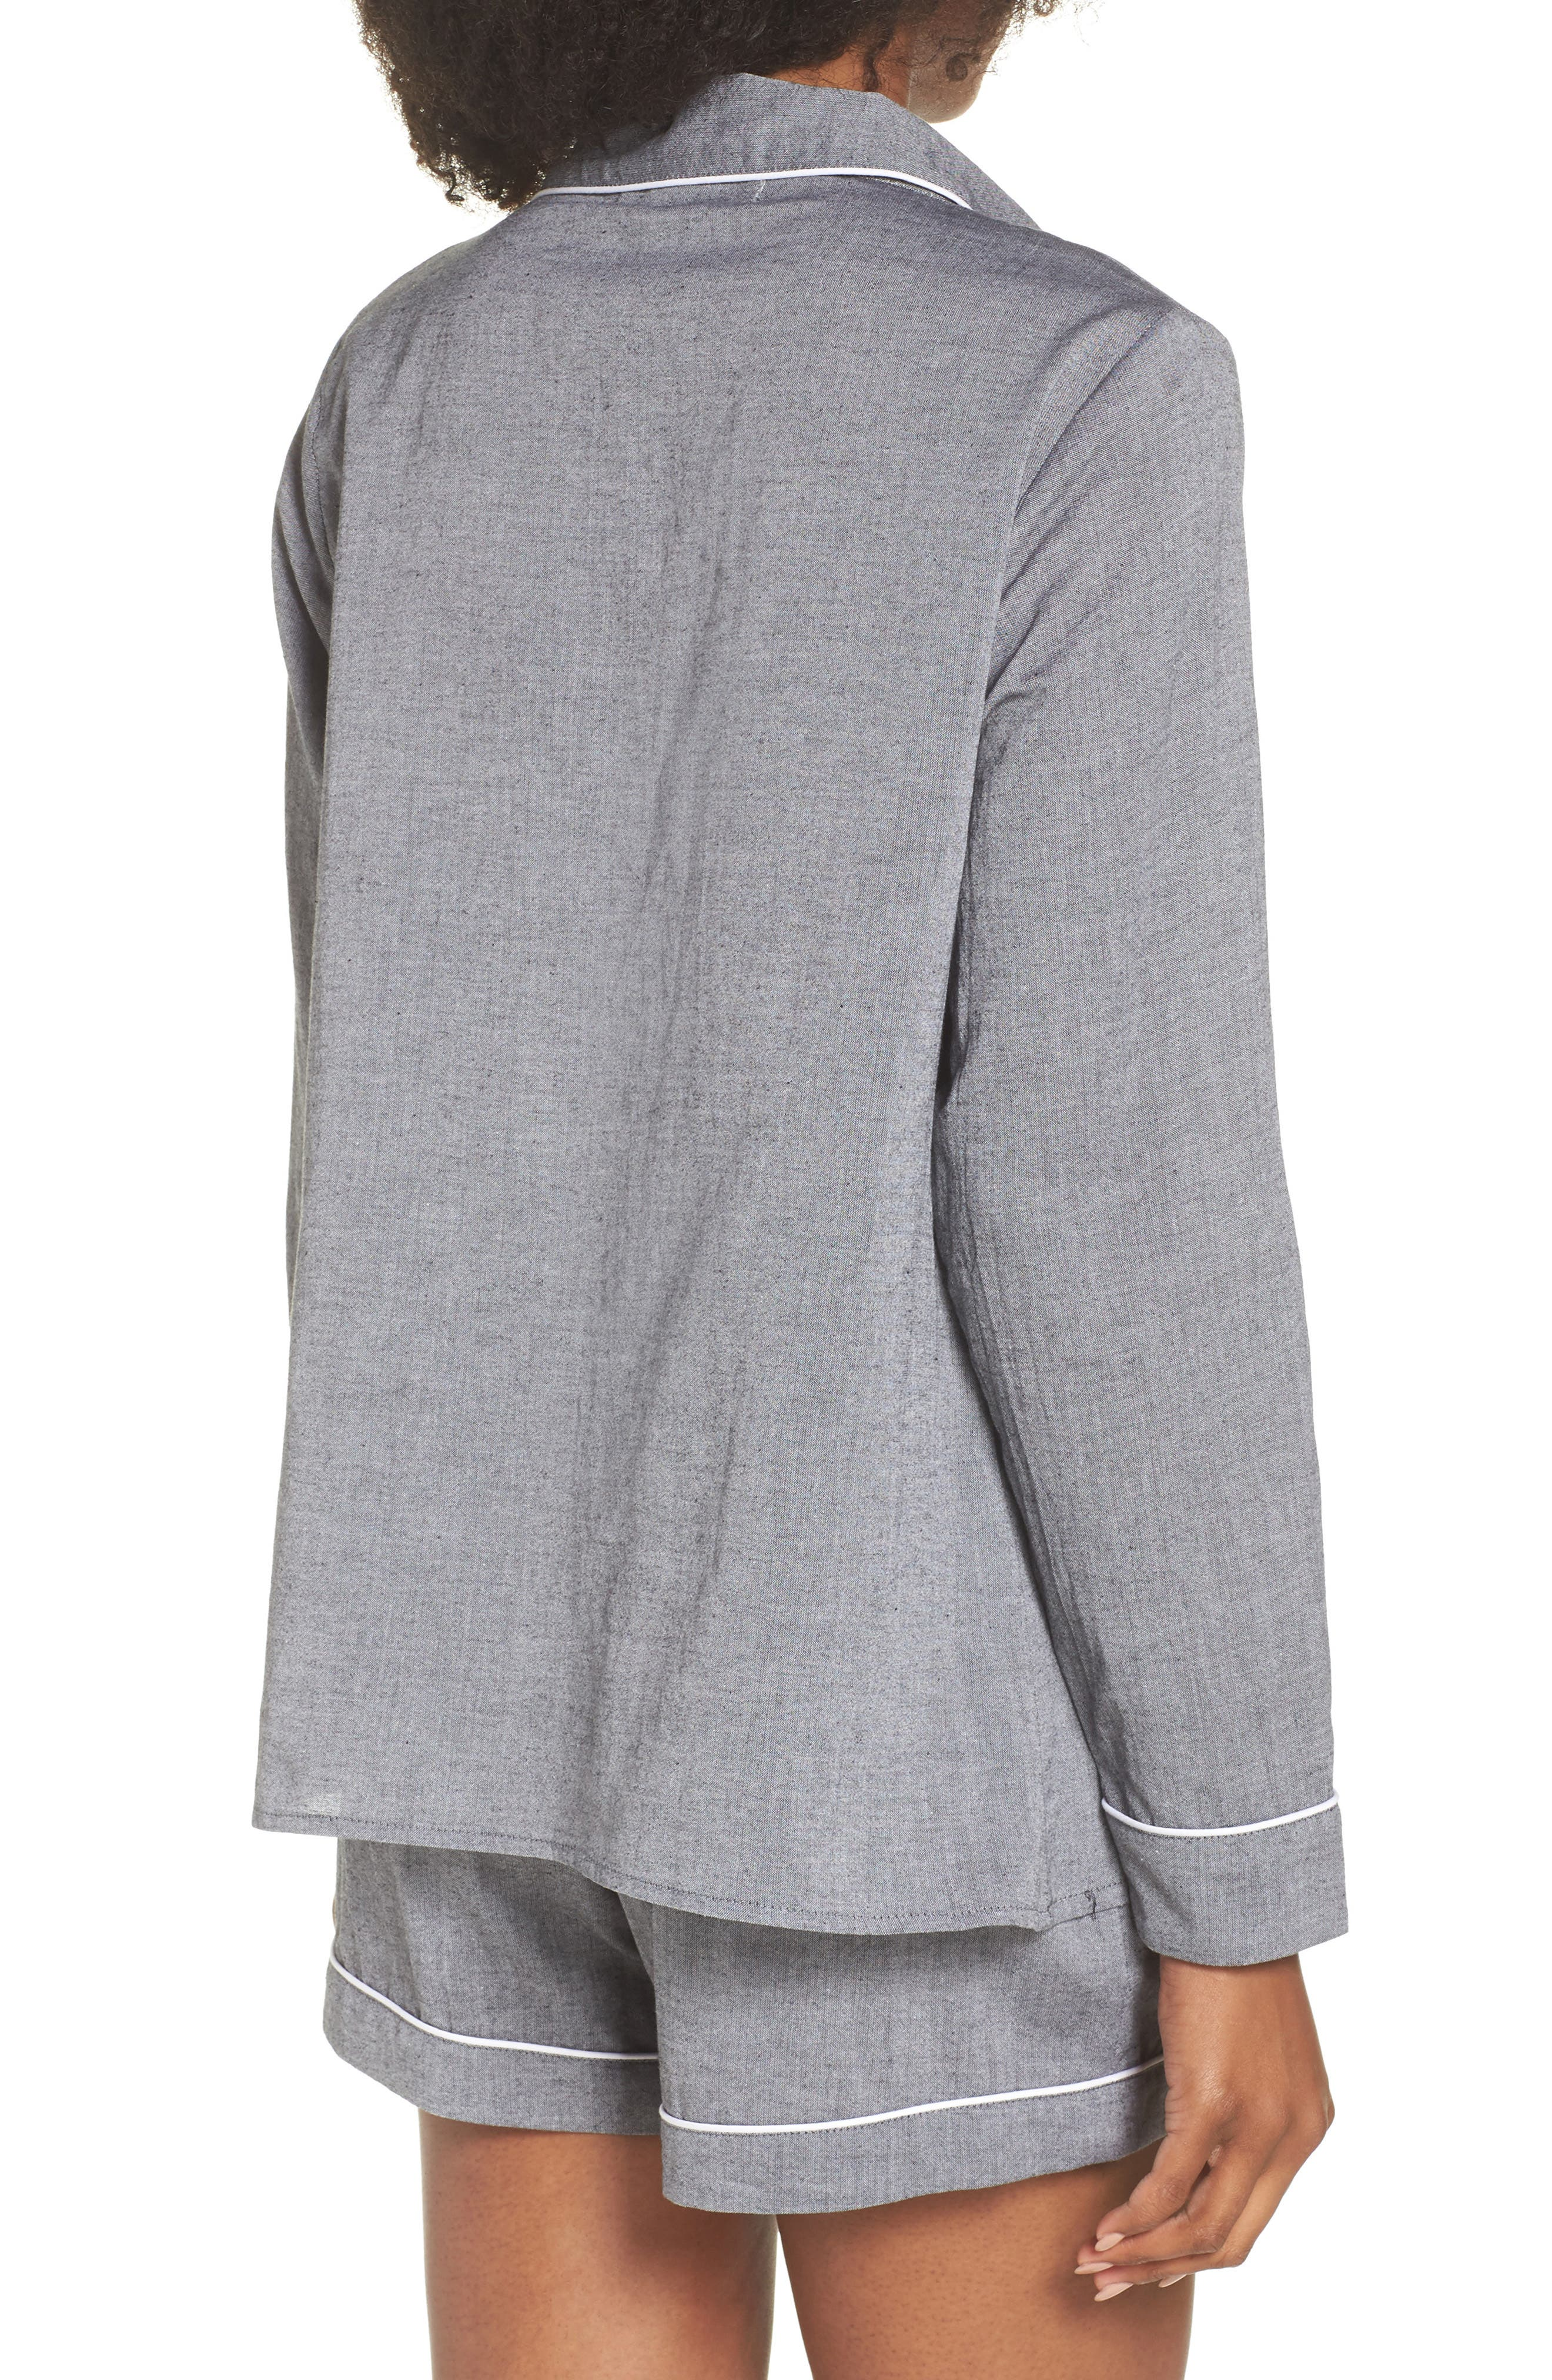 Short Pajamas,                             Alternate thumbnail 2, color,                             Charcoal